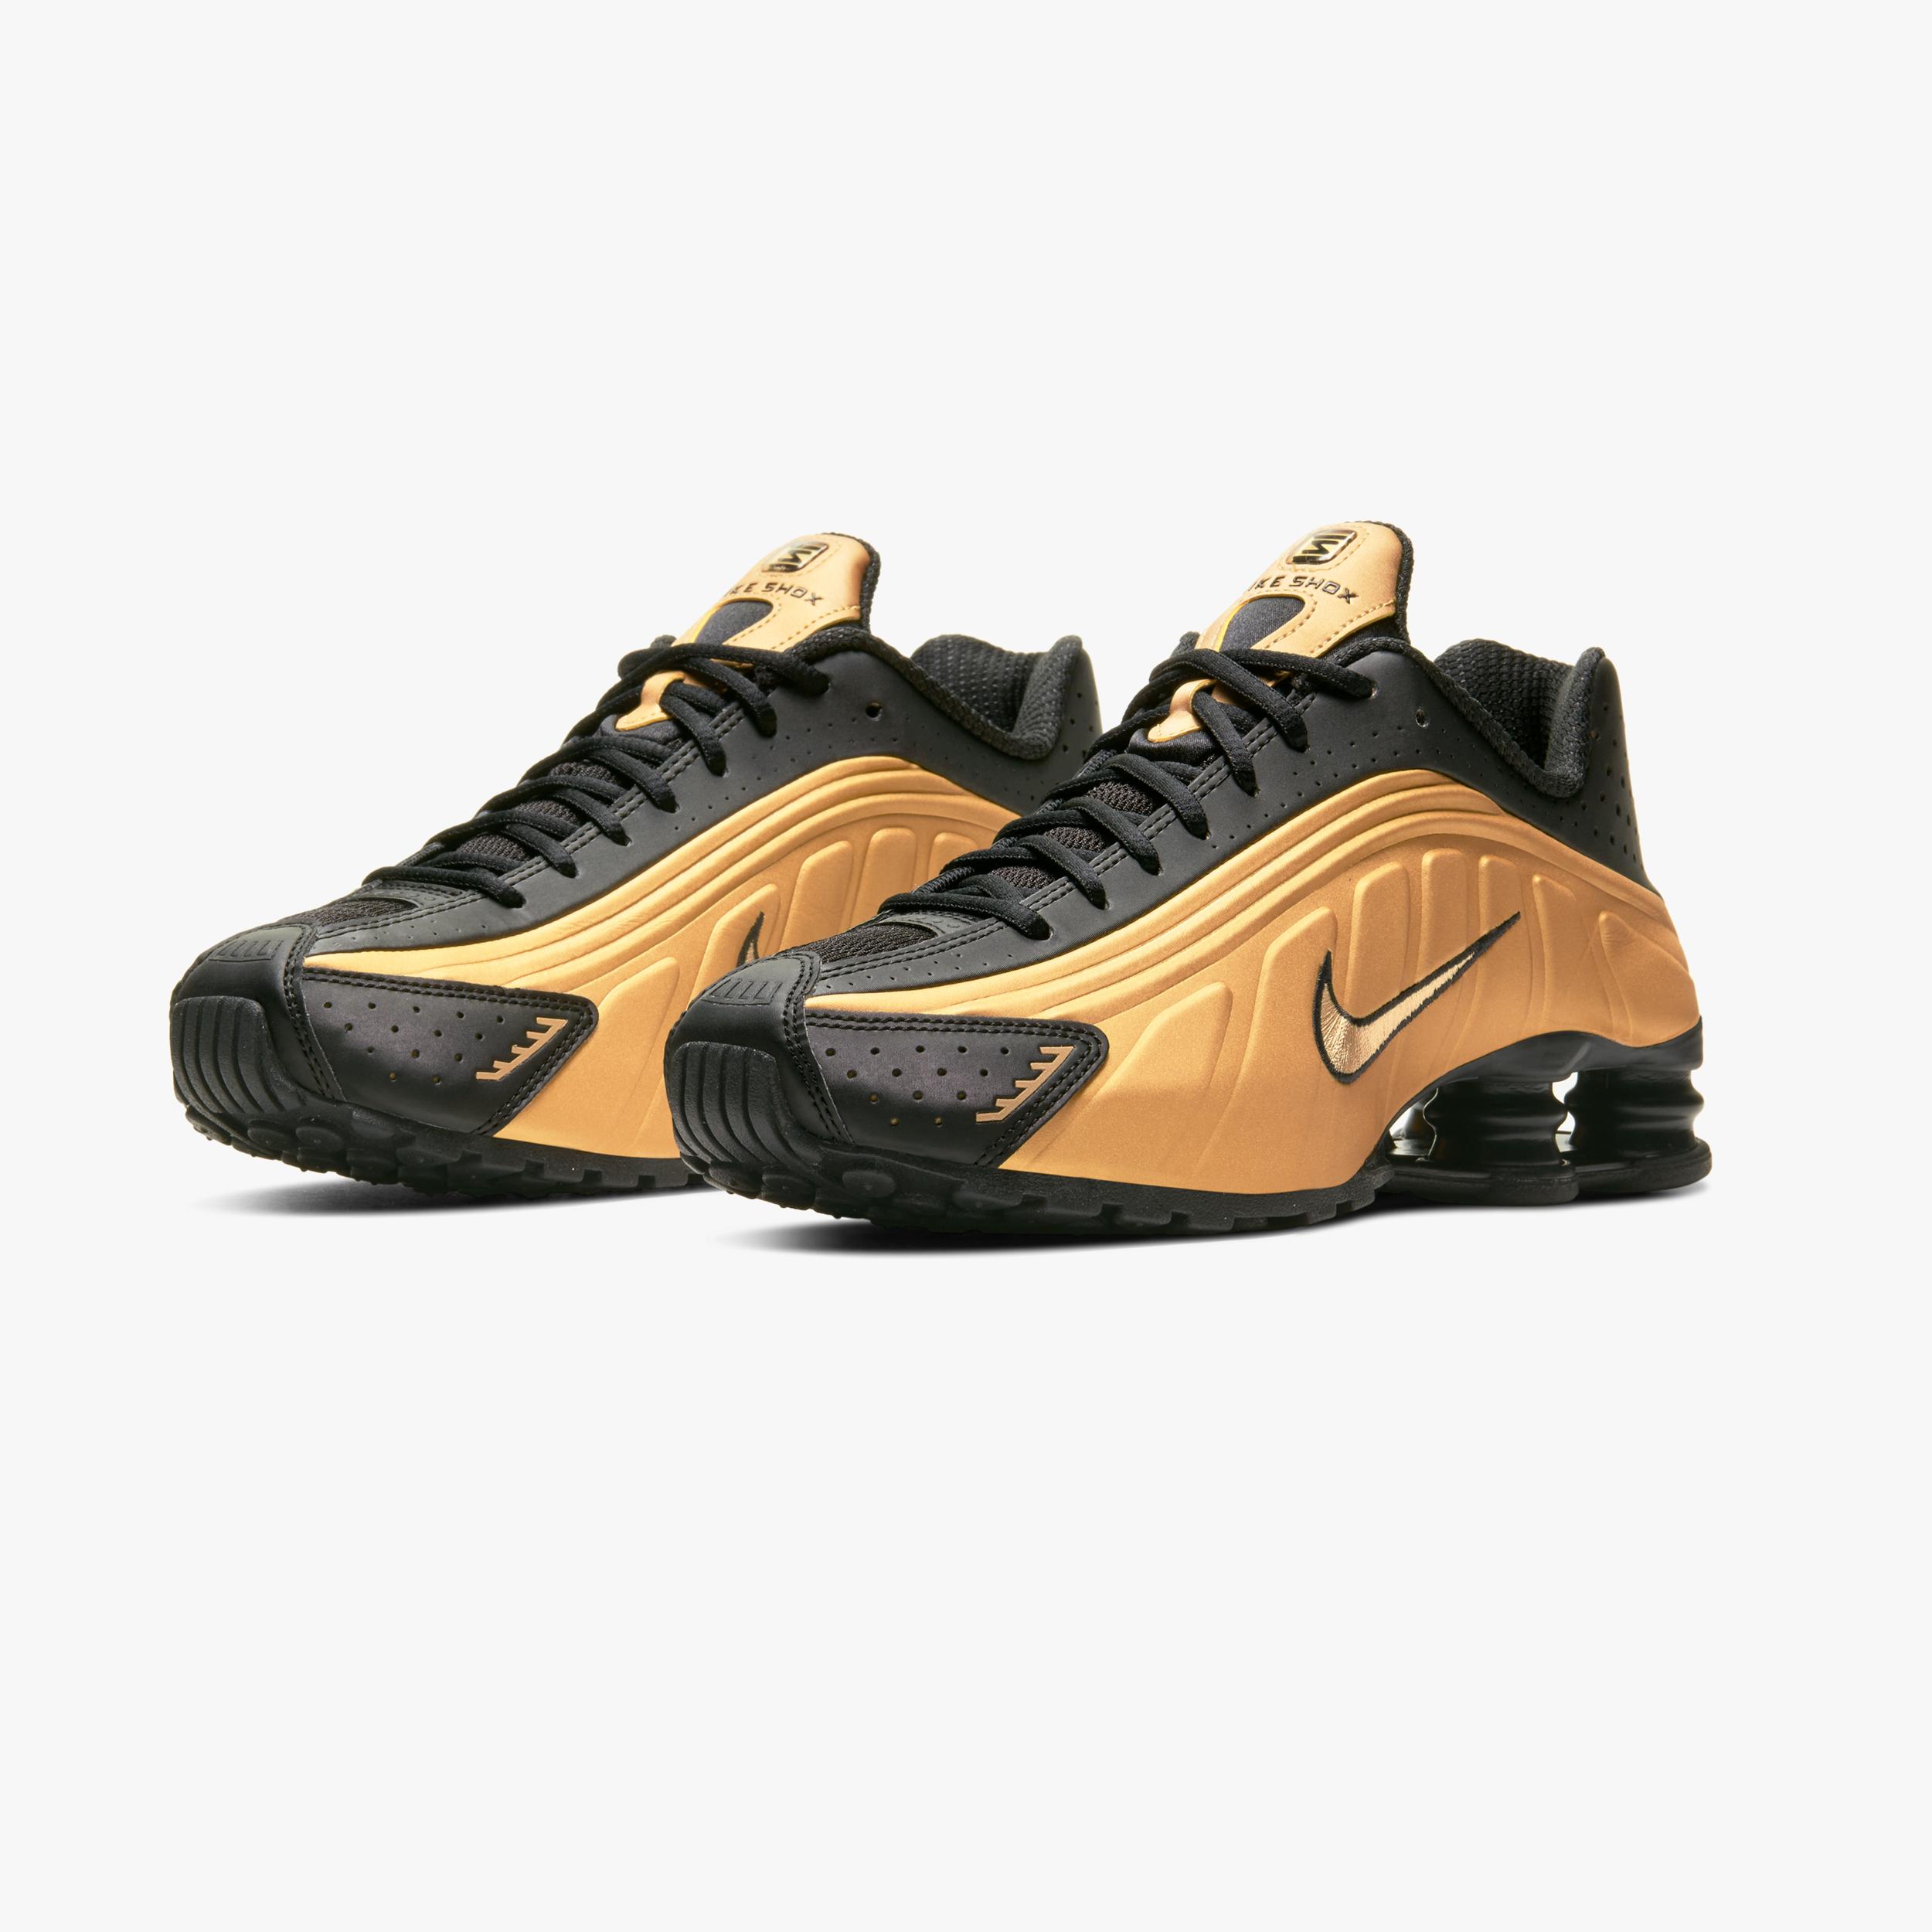 Nike Nike Shox R4 - 104265-702